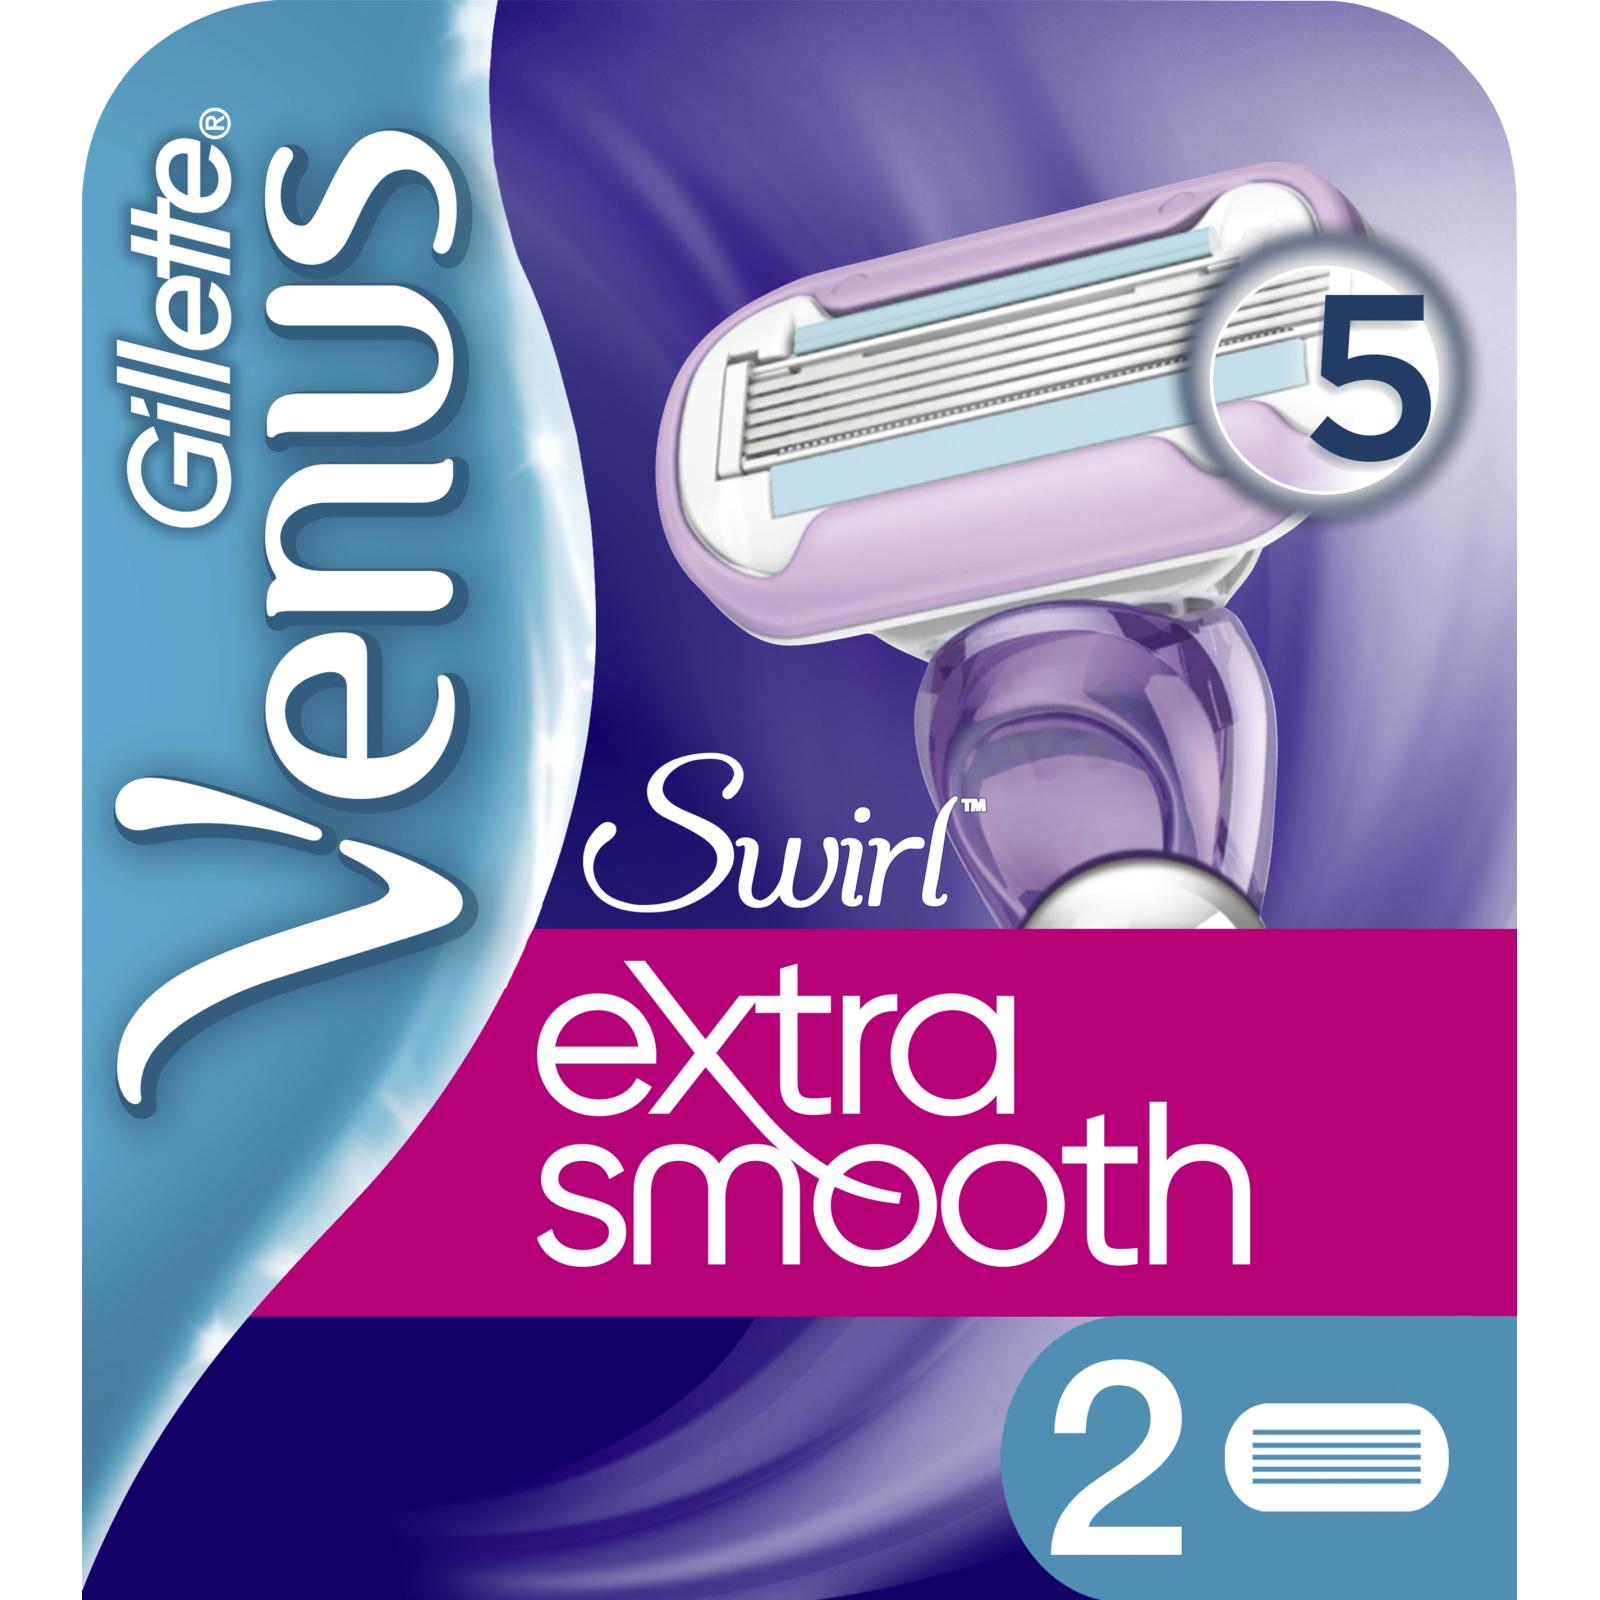 Сменные кассеты Gillette Venus Swirl, 2 шт (7702018401116)